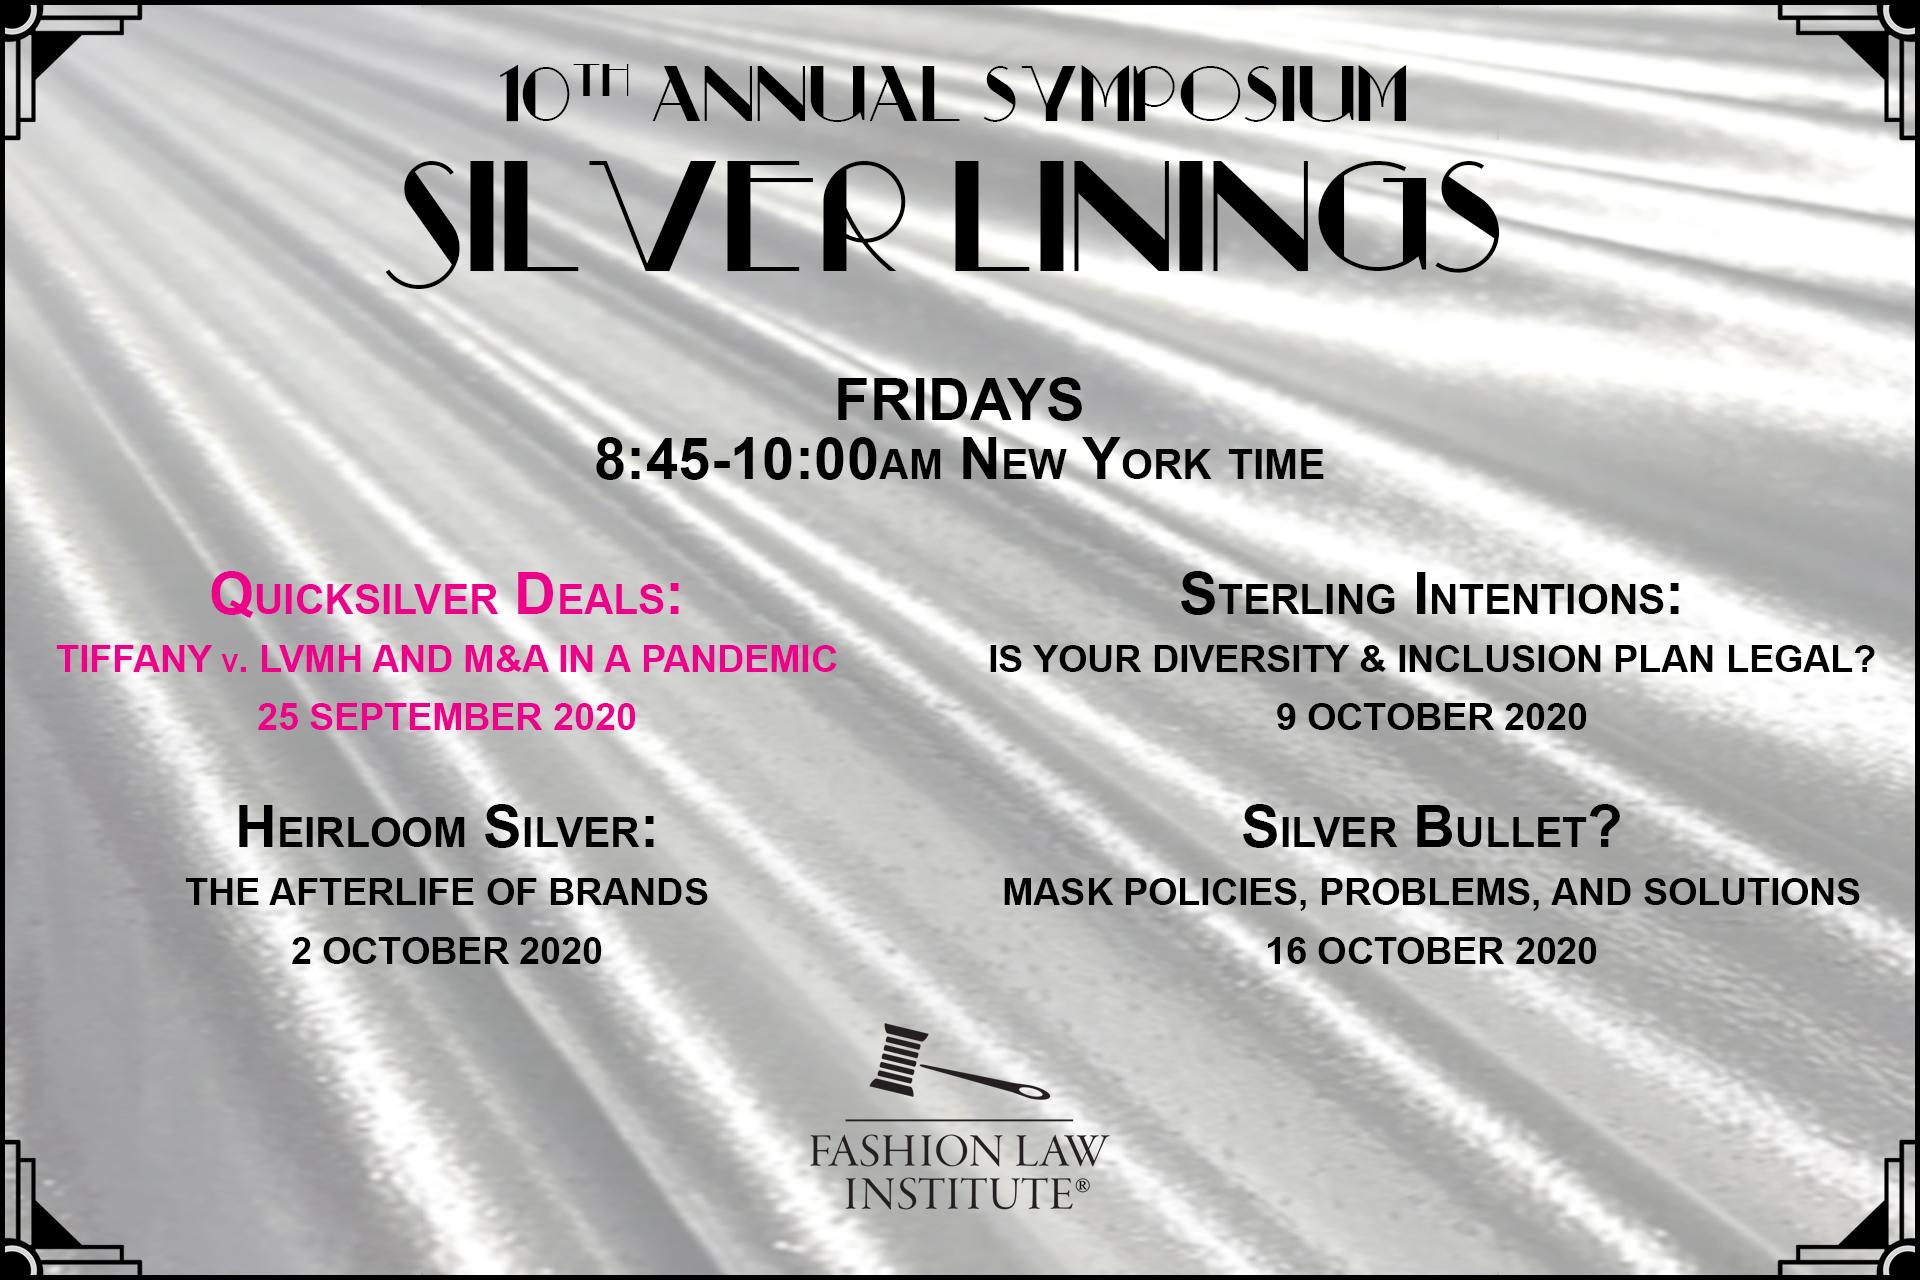 10 annual symposium September 25-October 16, 2020